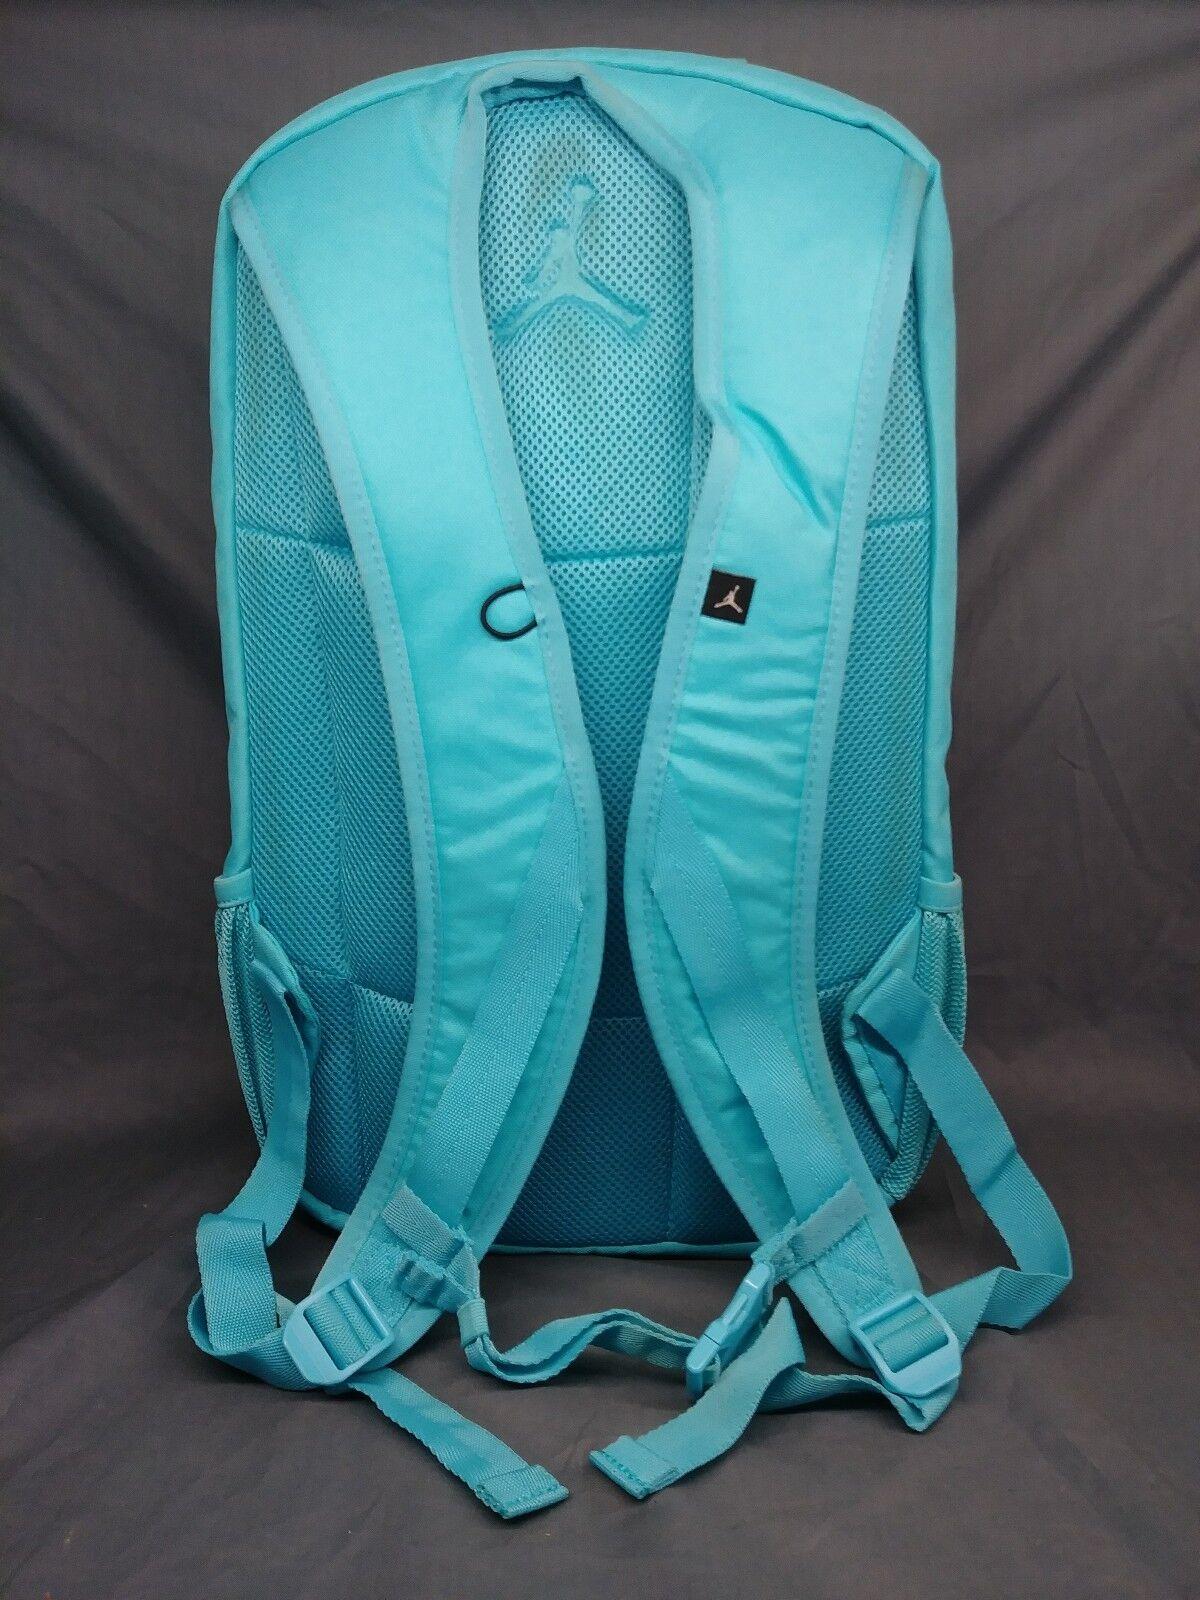 9930ce73d025 Jordan Aerofly Mania Backpack 546469 485 Gamma Blue royal for sale online